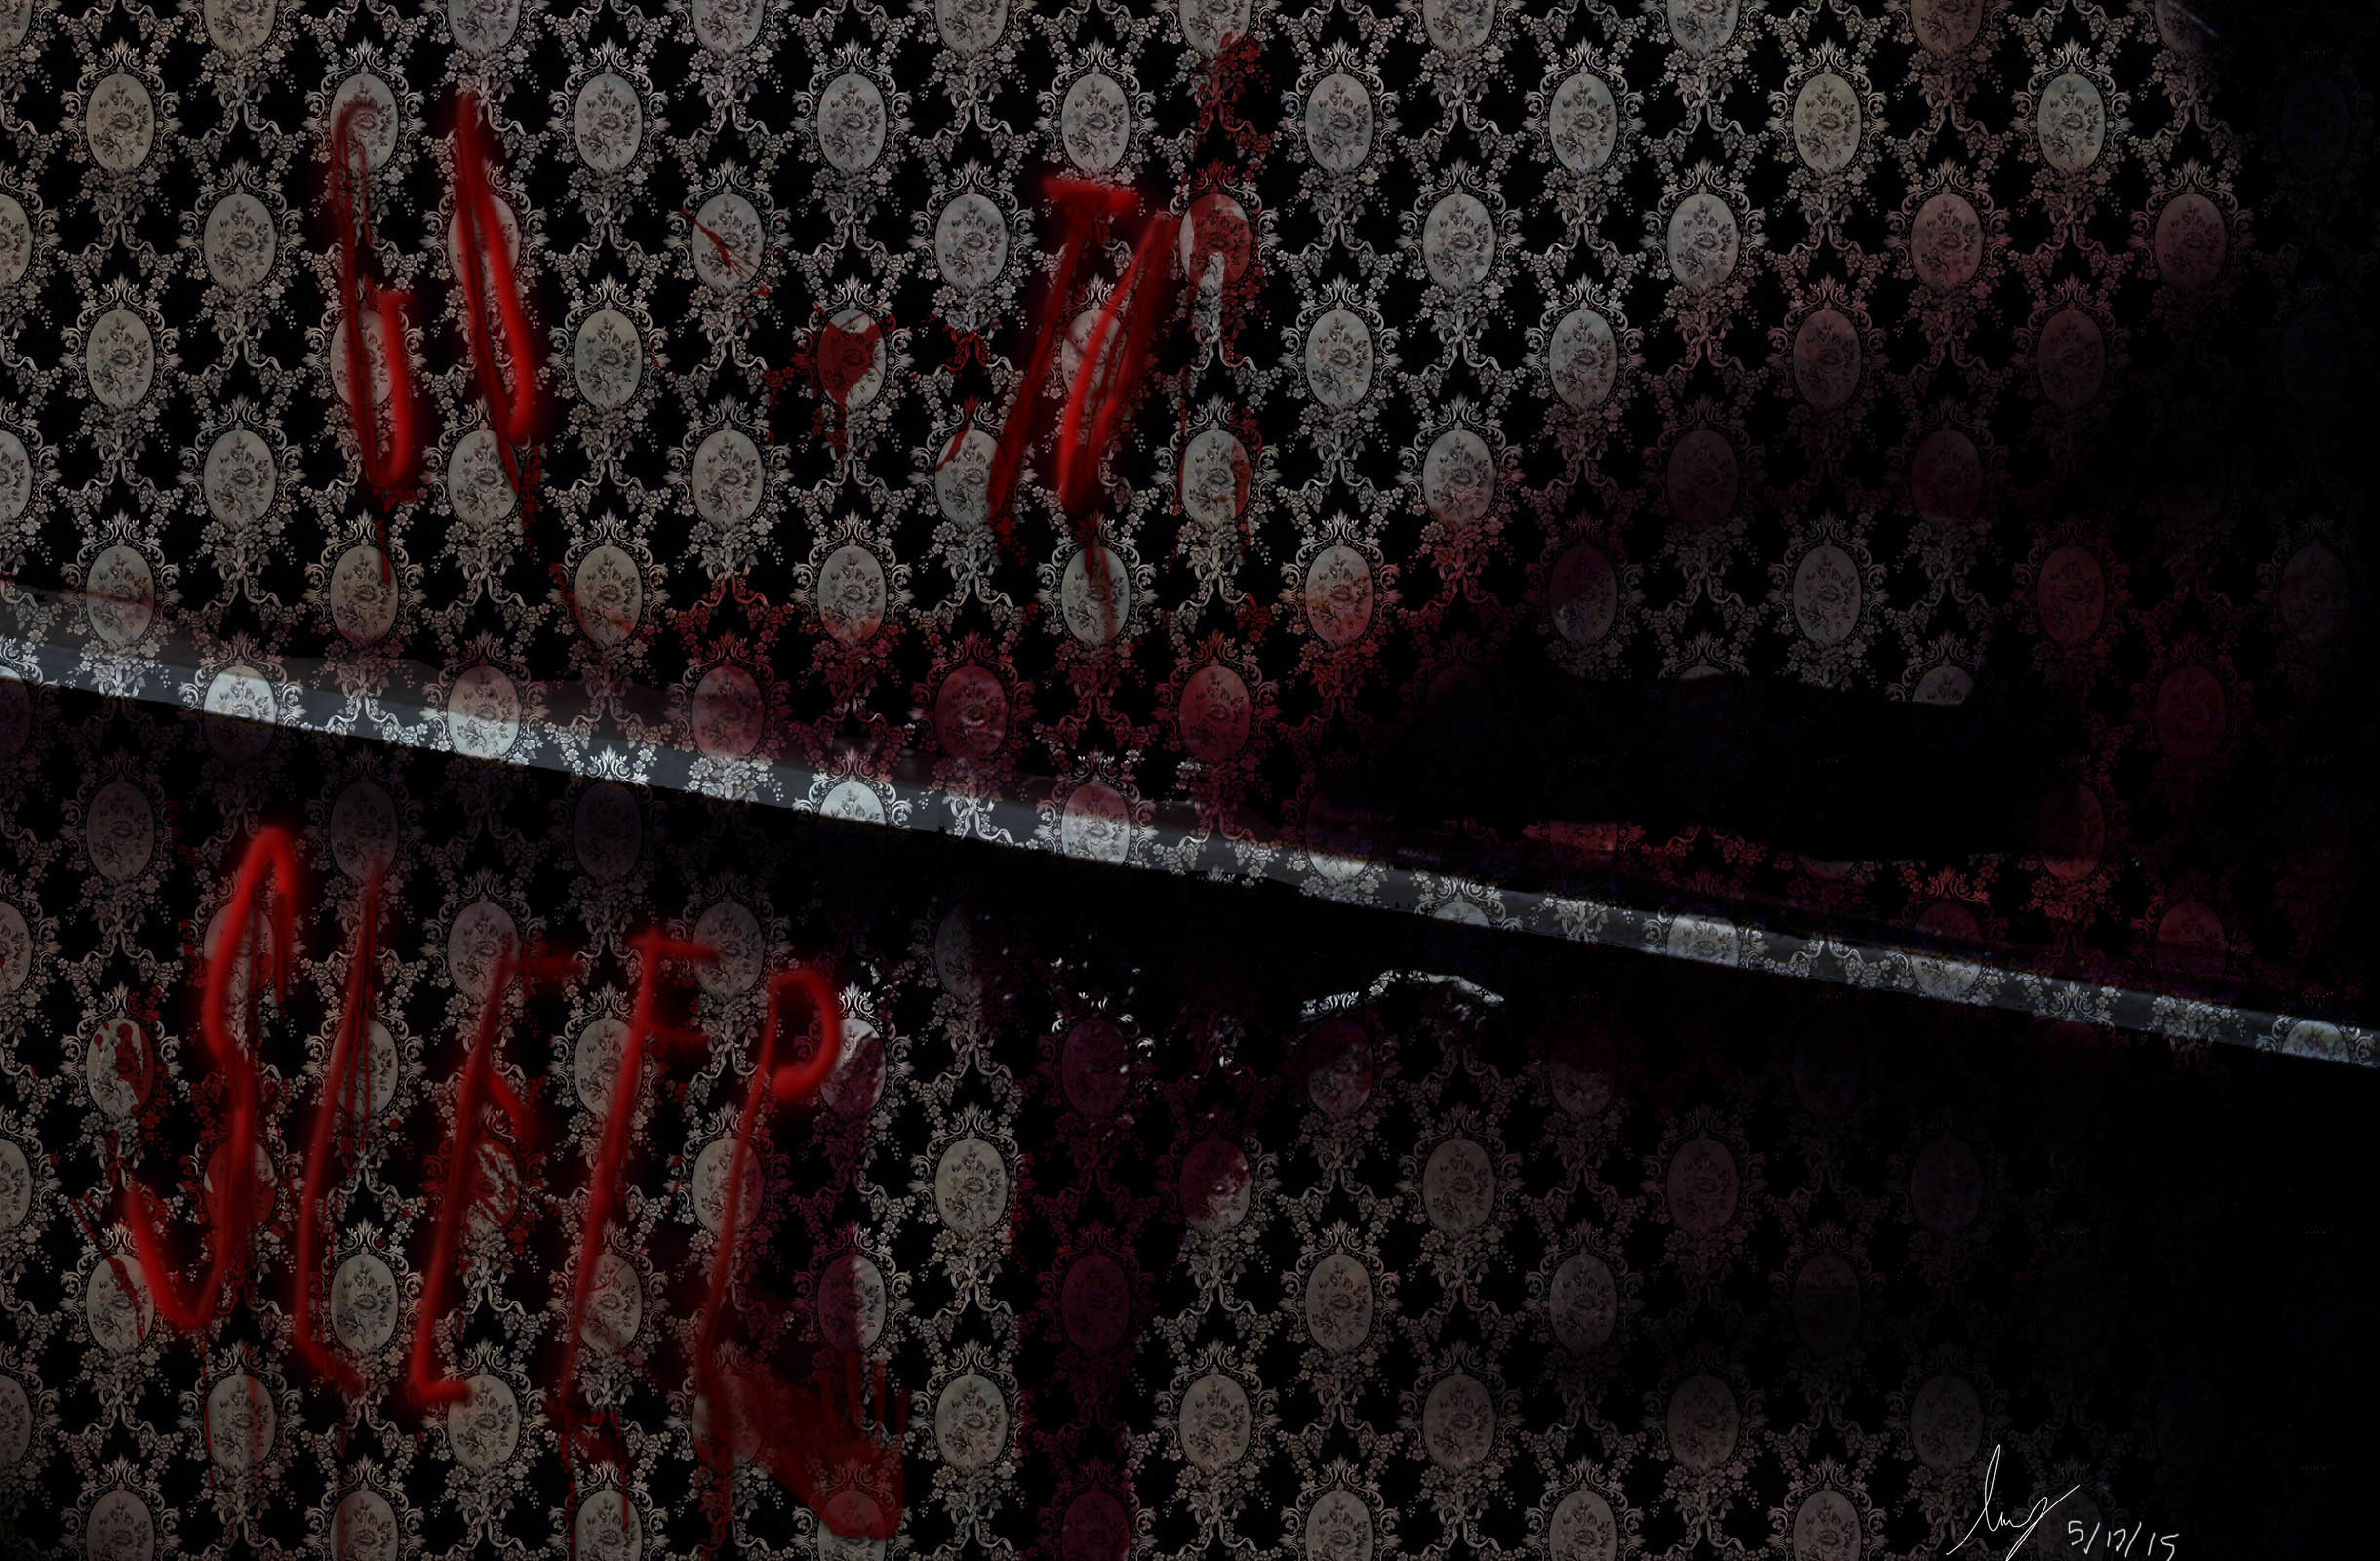 … Go to sleep Jeff the Killer wallpaper by IvyDarkRose